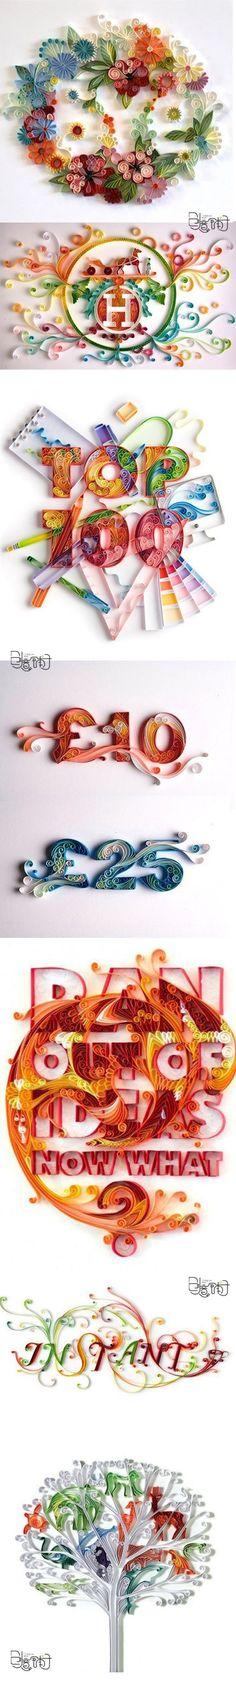 Amazing rolling paper art decoration!